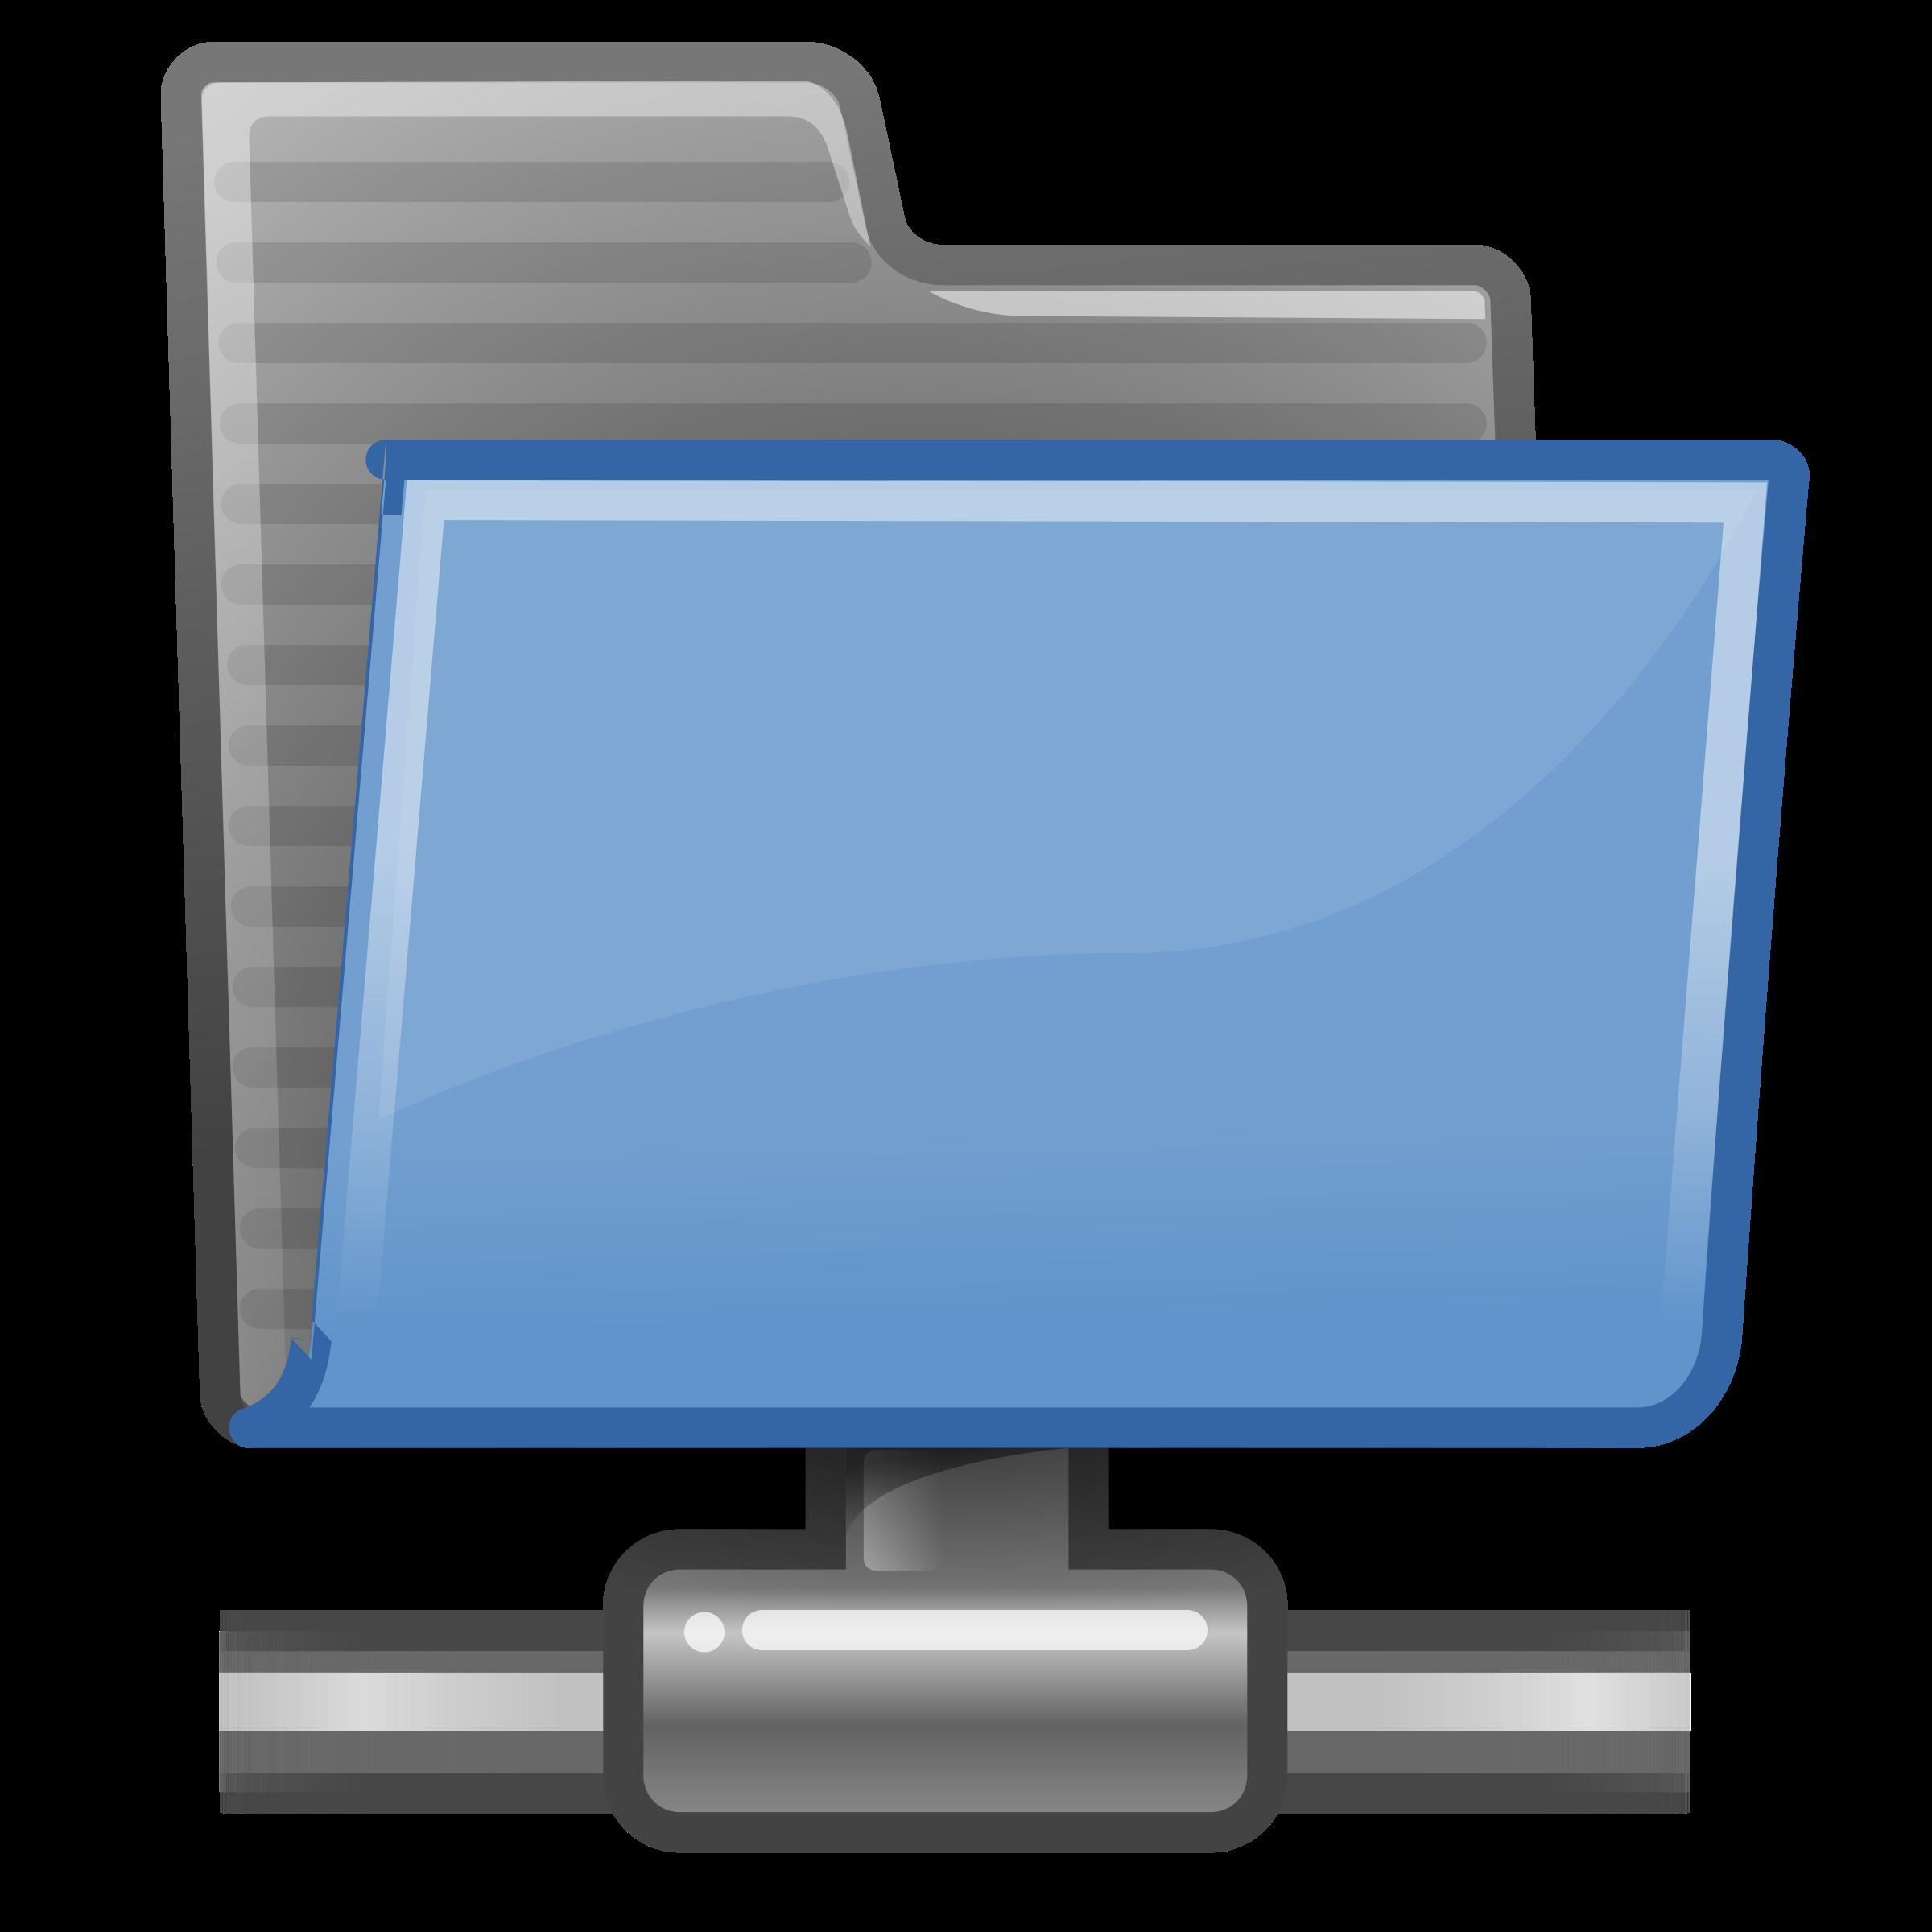 Folder clipart blue folder. Tango remote big image